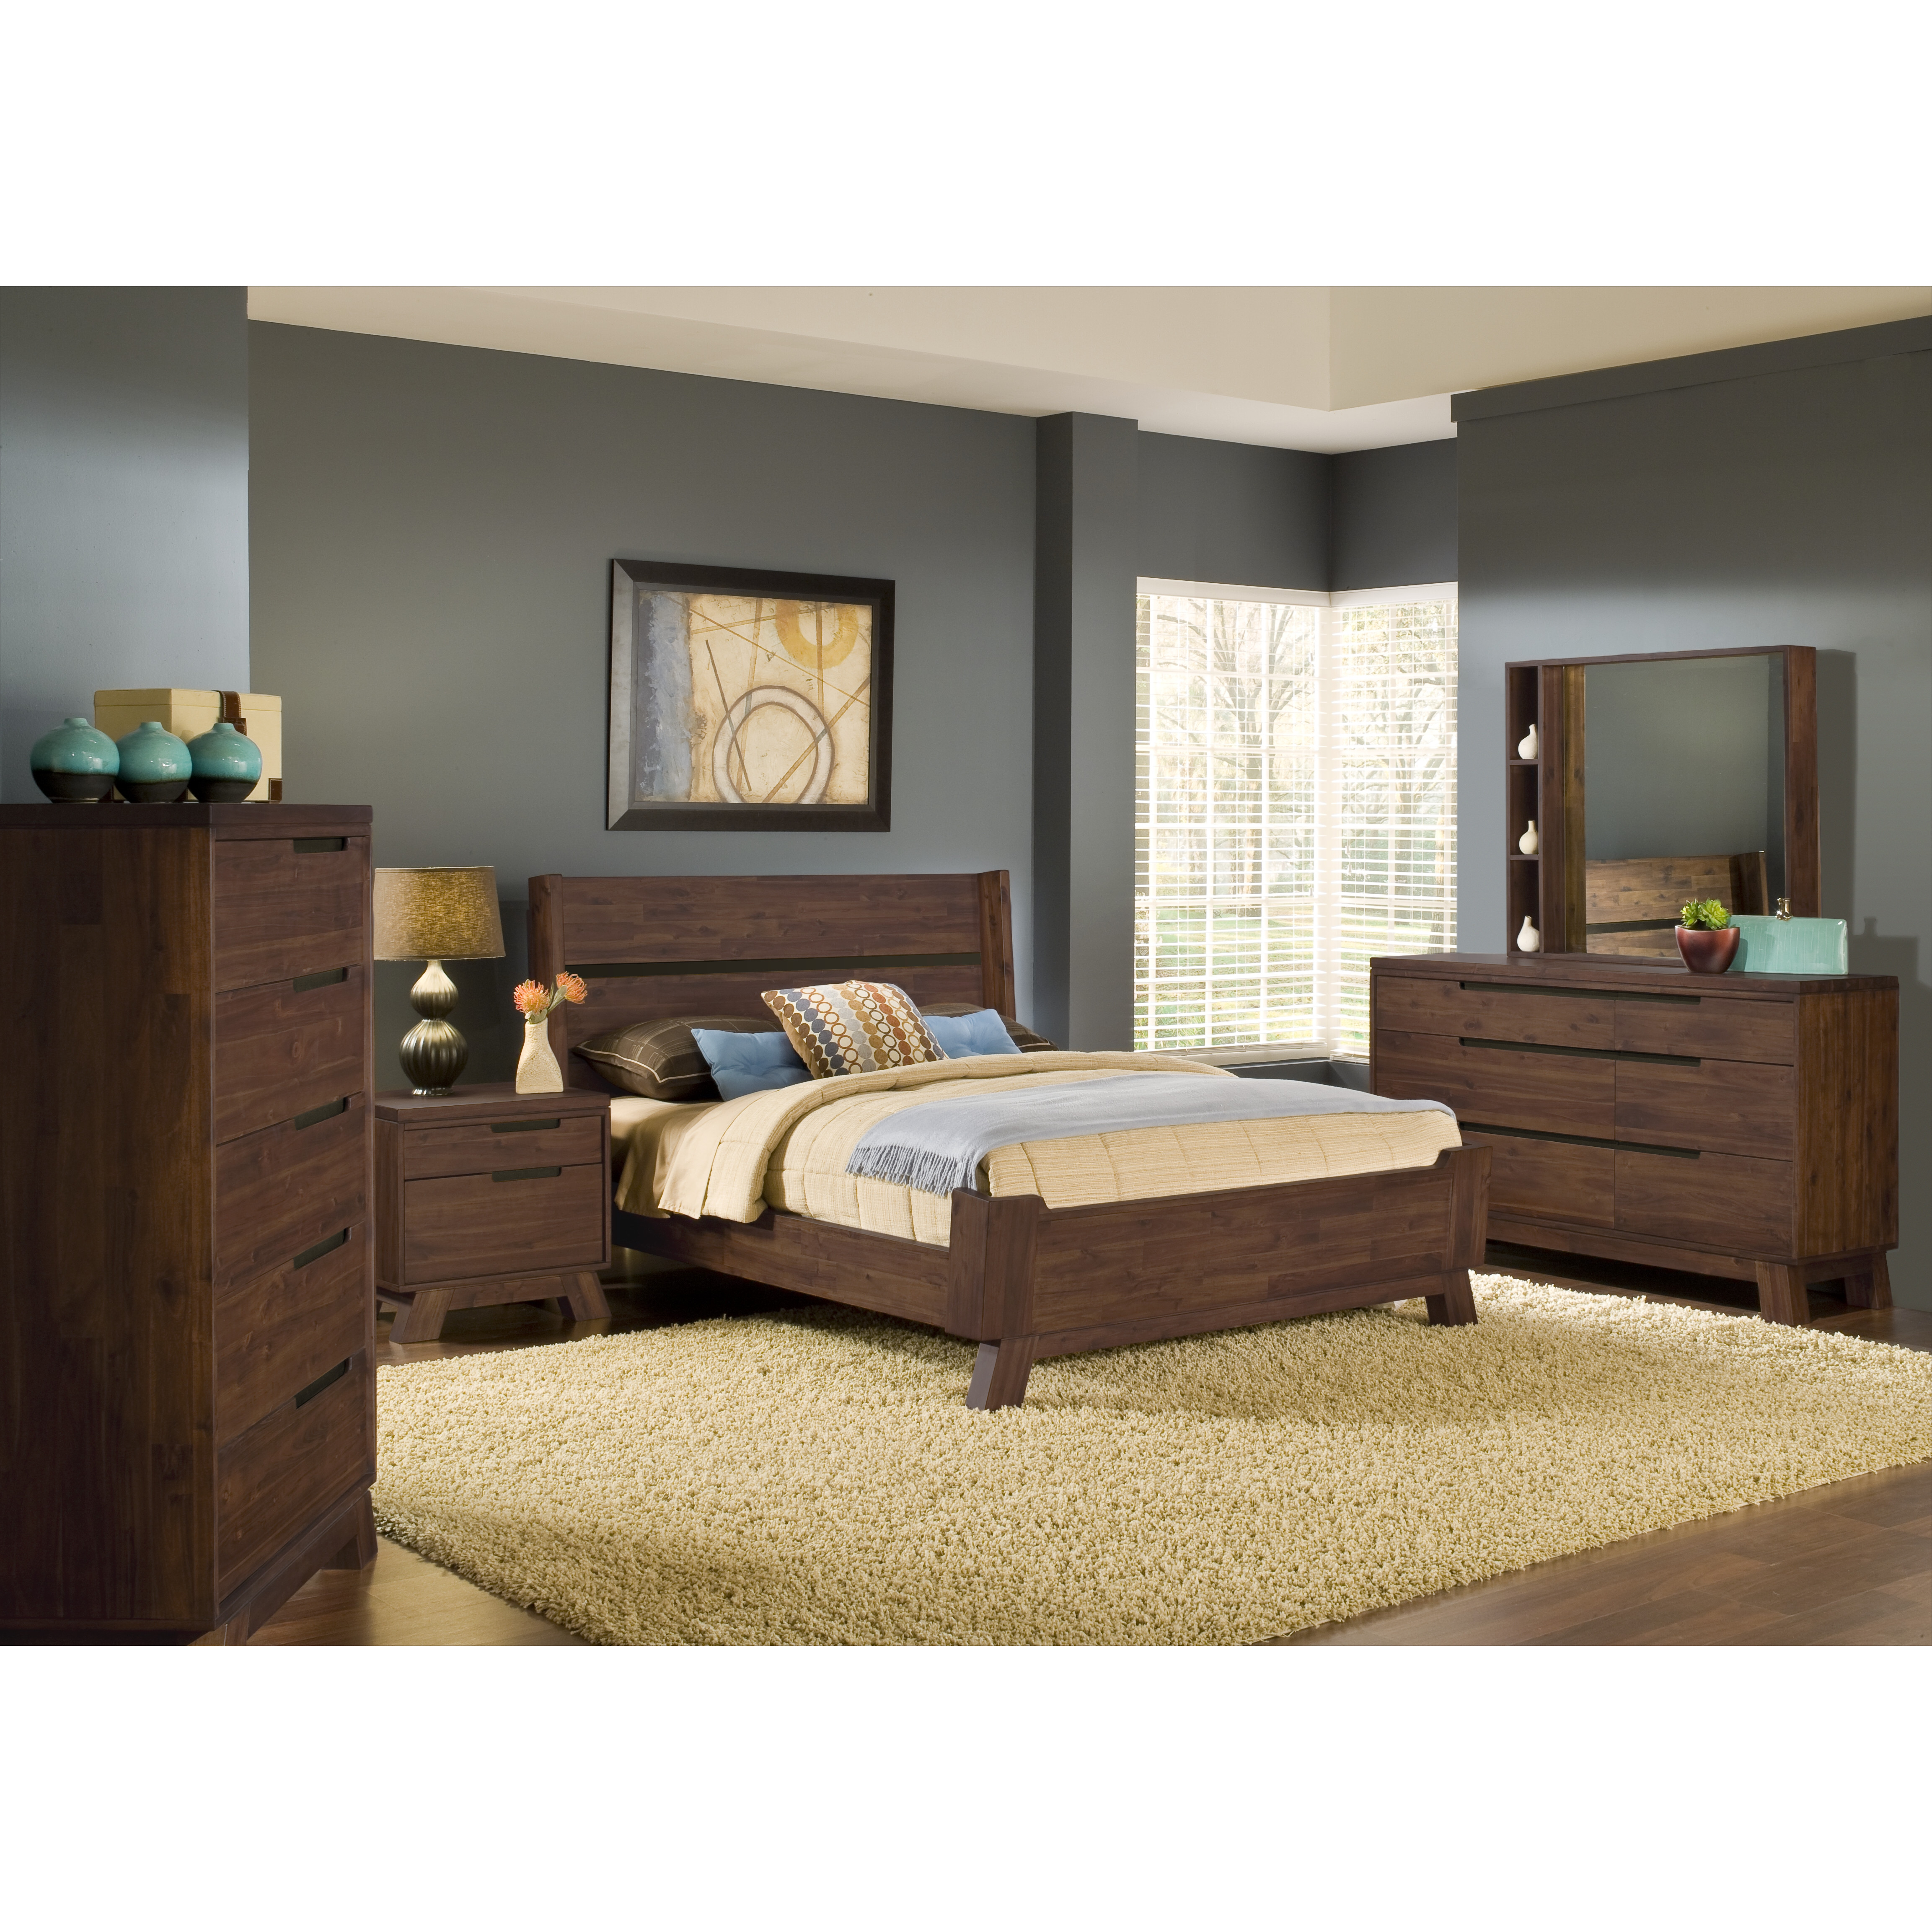 broadway furniture portland oregon